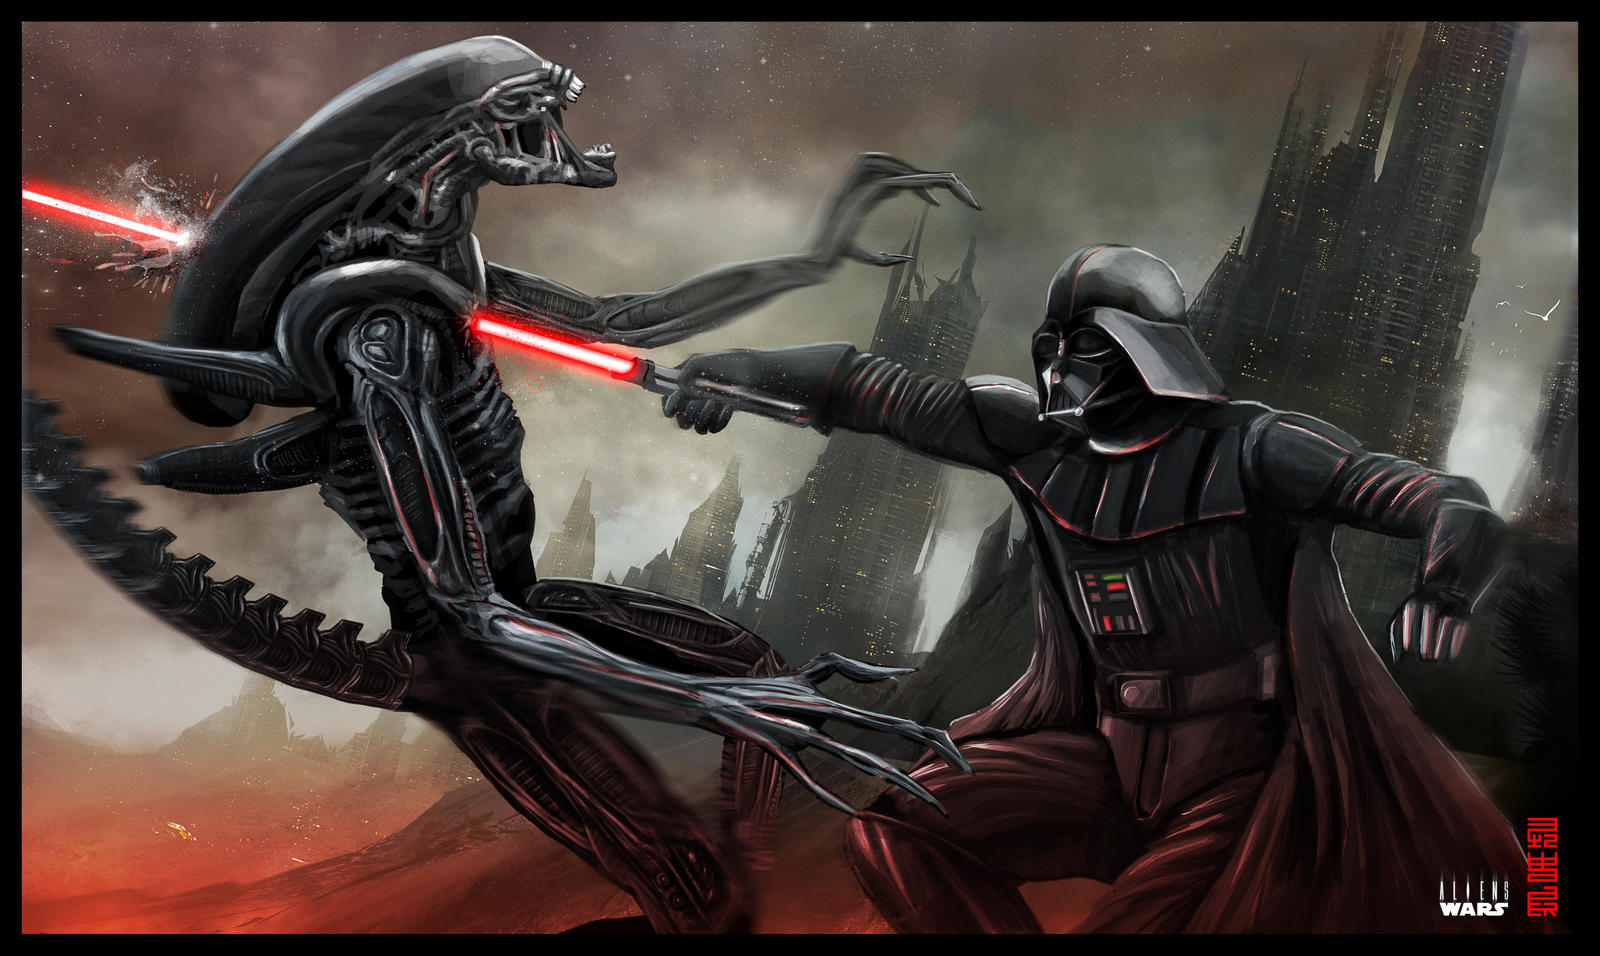 [Image: aliens_wars_by_byzko_wader-d54q3rp.jpg]